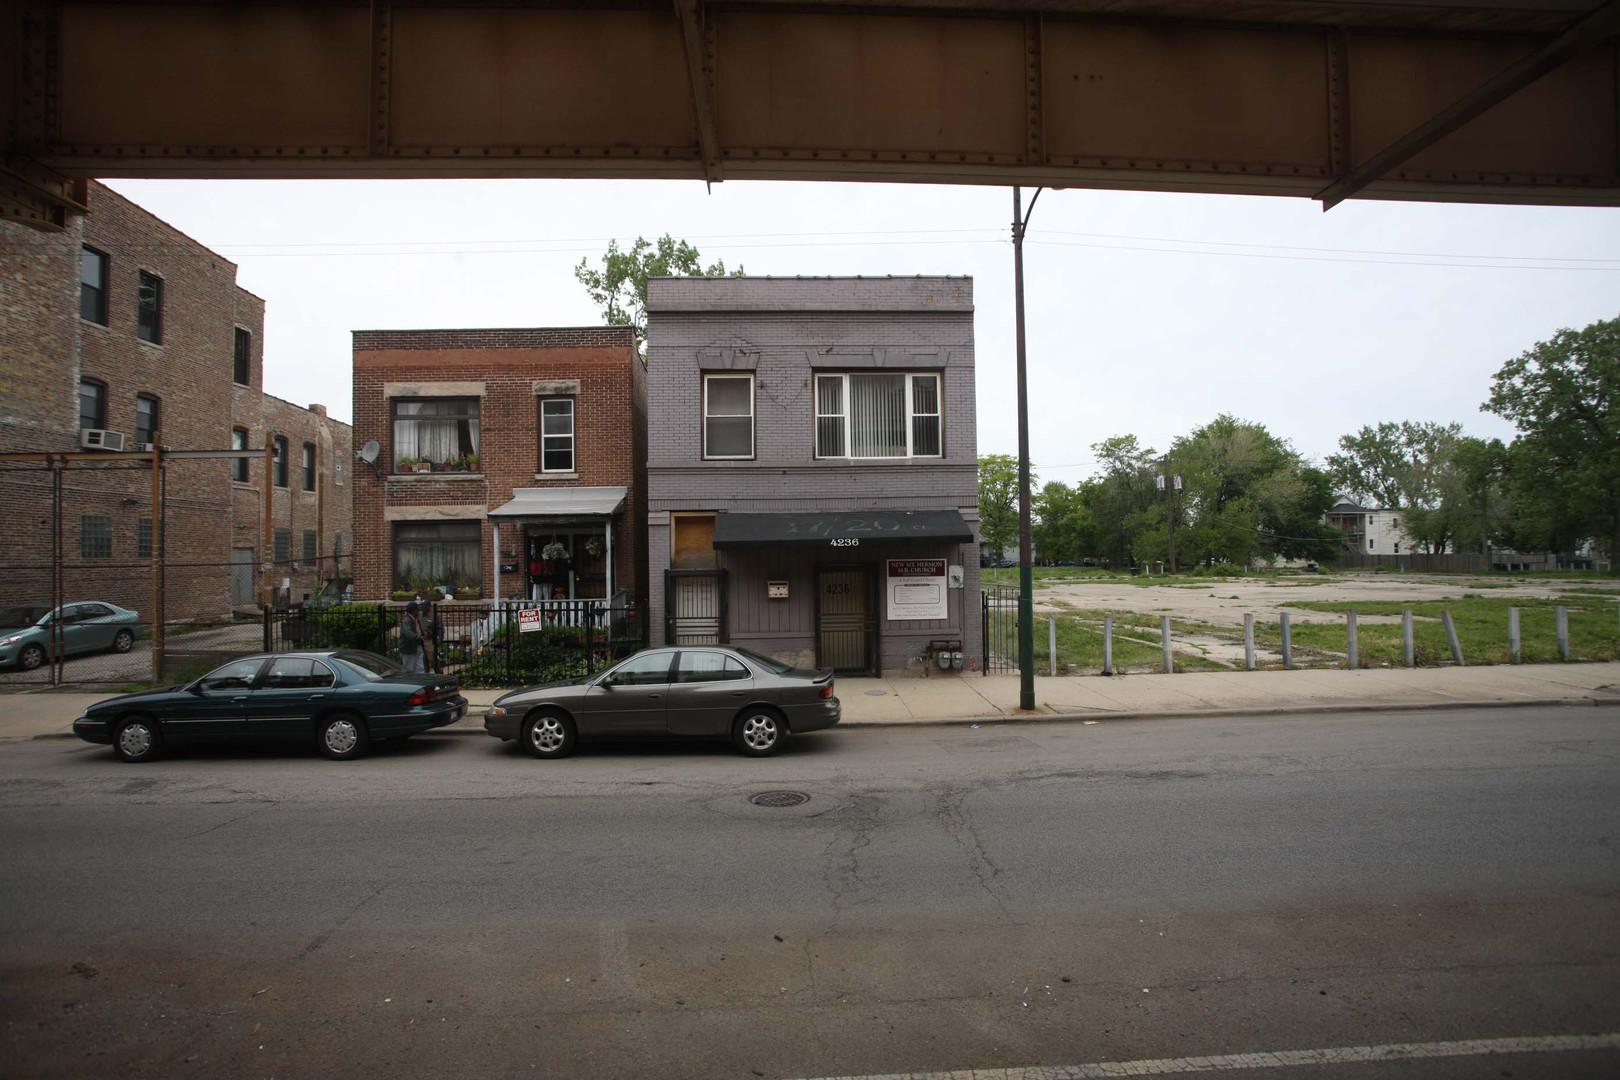 4236 W Lake Street, Chicago, IL 60624